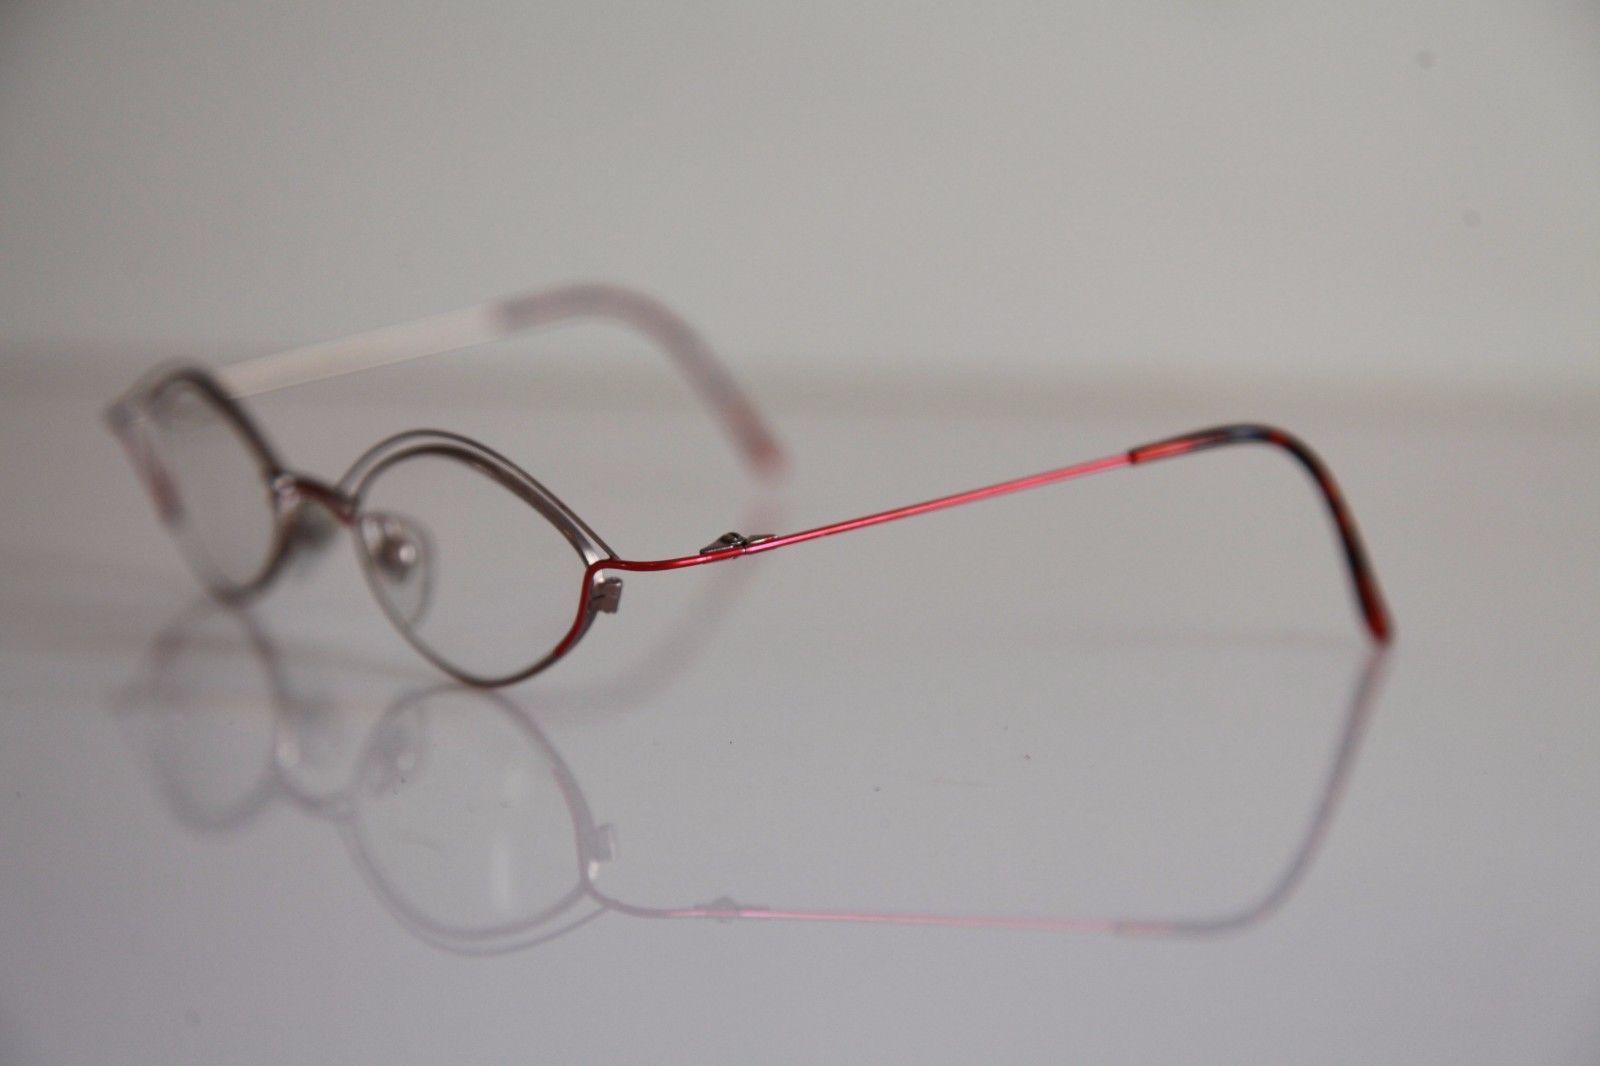 OBERMANN OPTIK Eyewear, Silver, Red Frame,  RX-Able Prescription lenses.